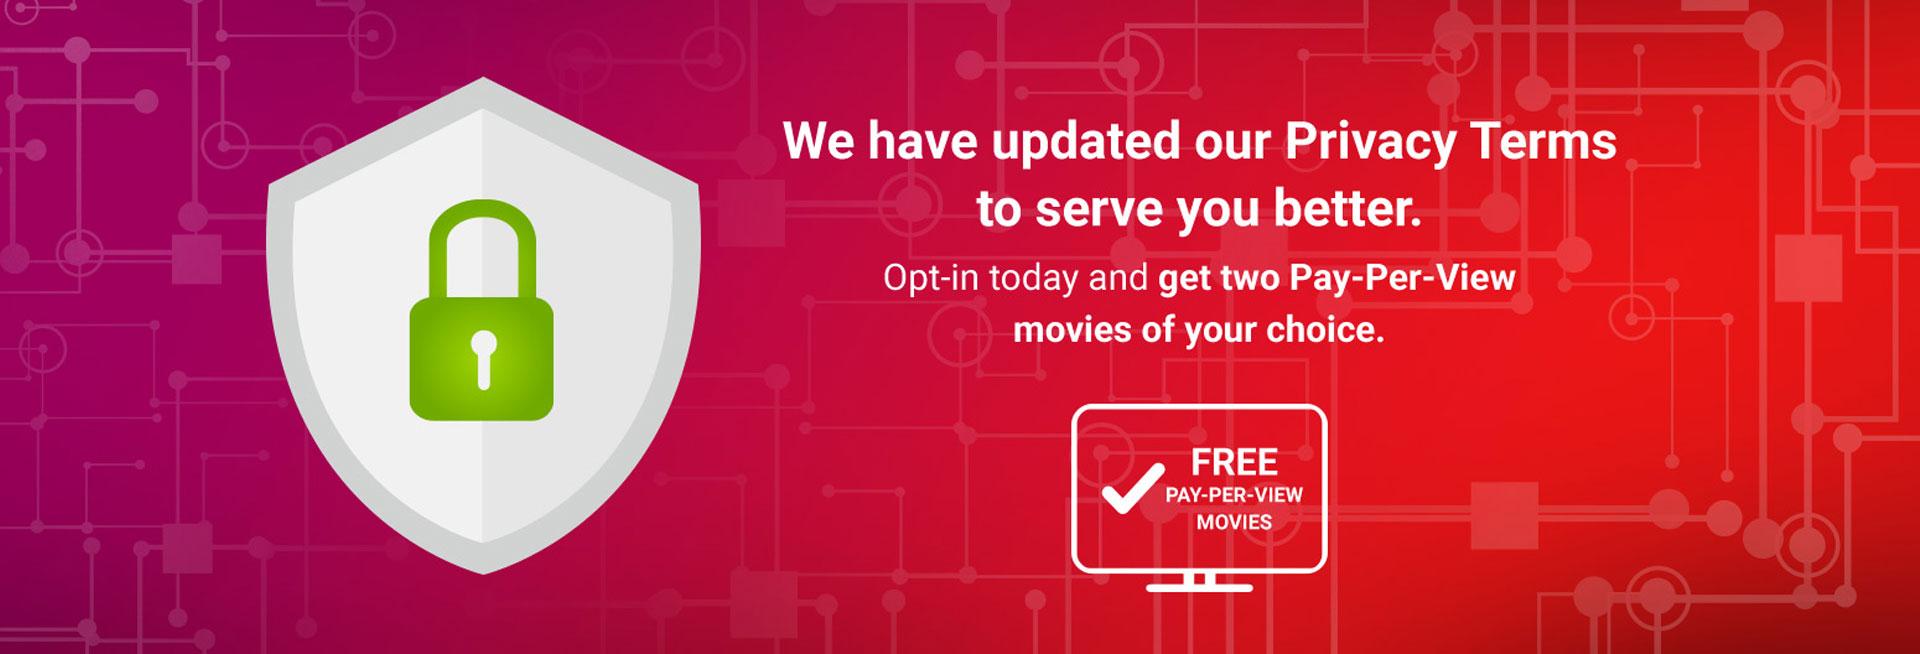 cignal tv data privacy